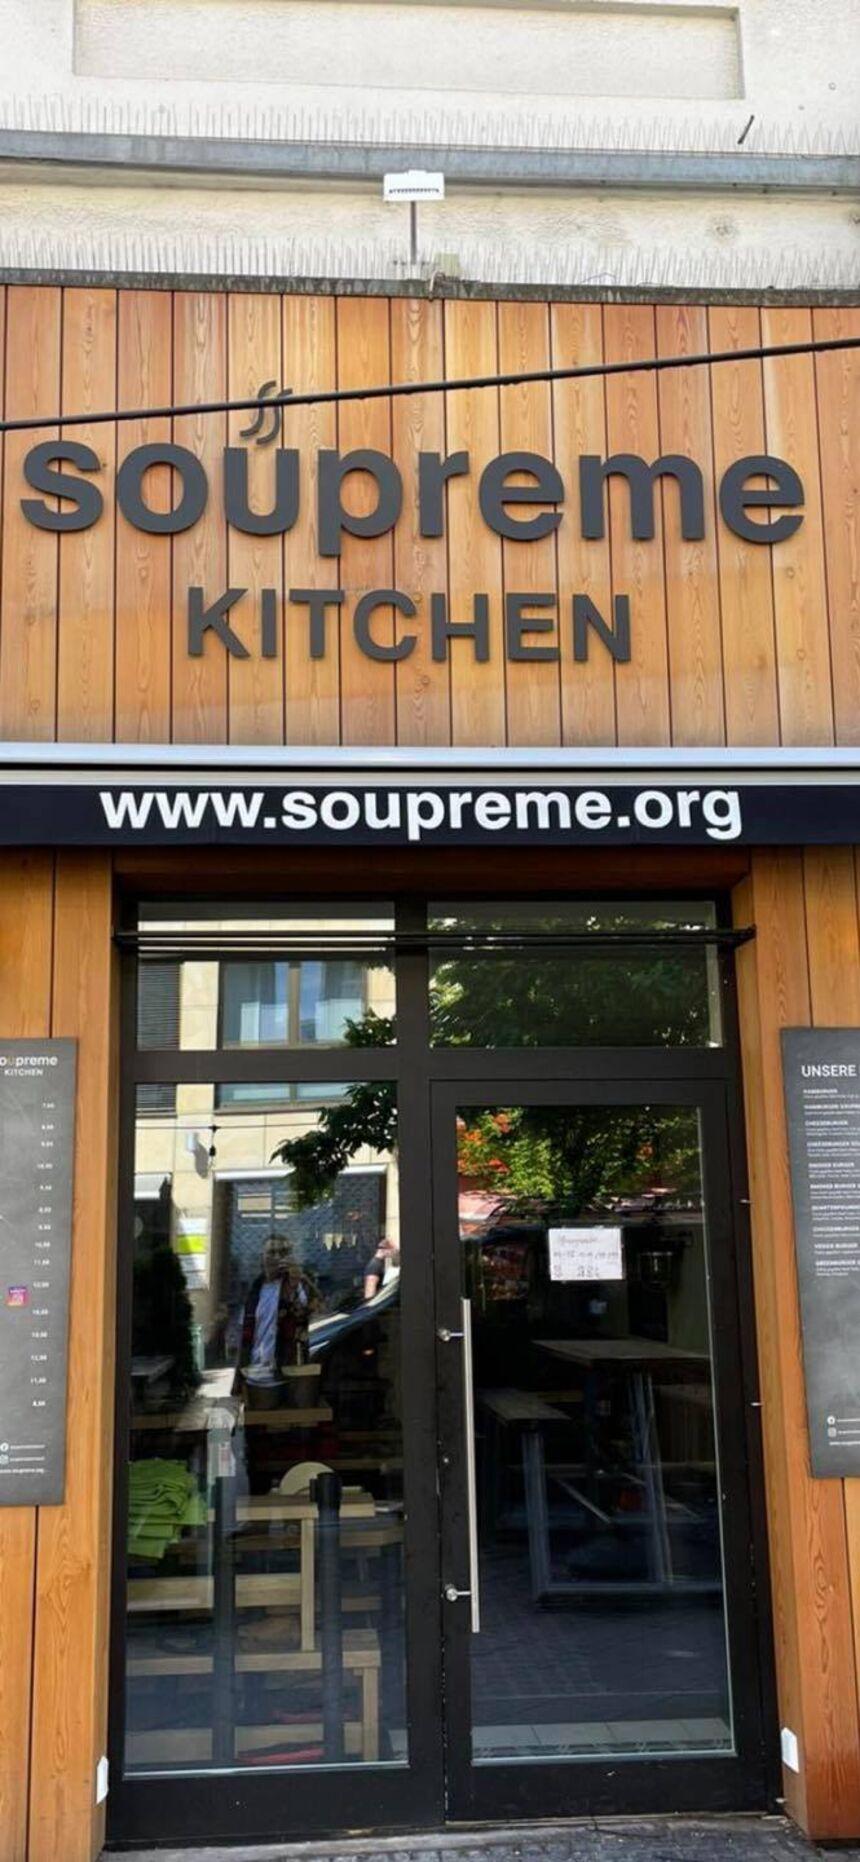 Soupreme Kitchen